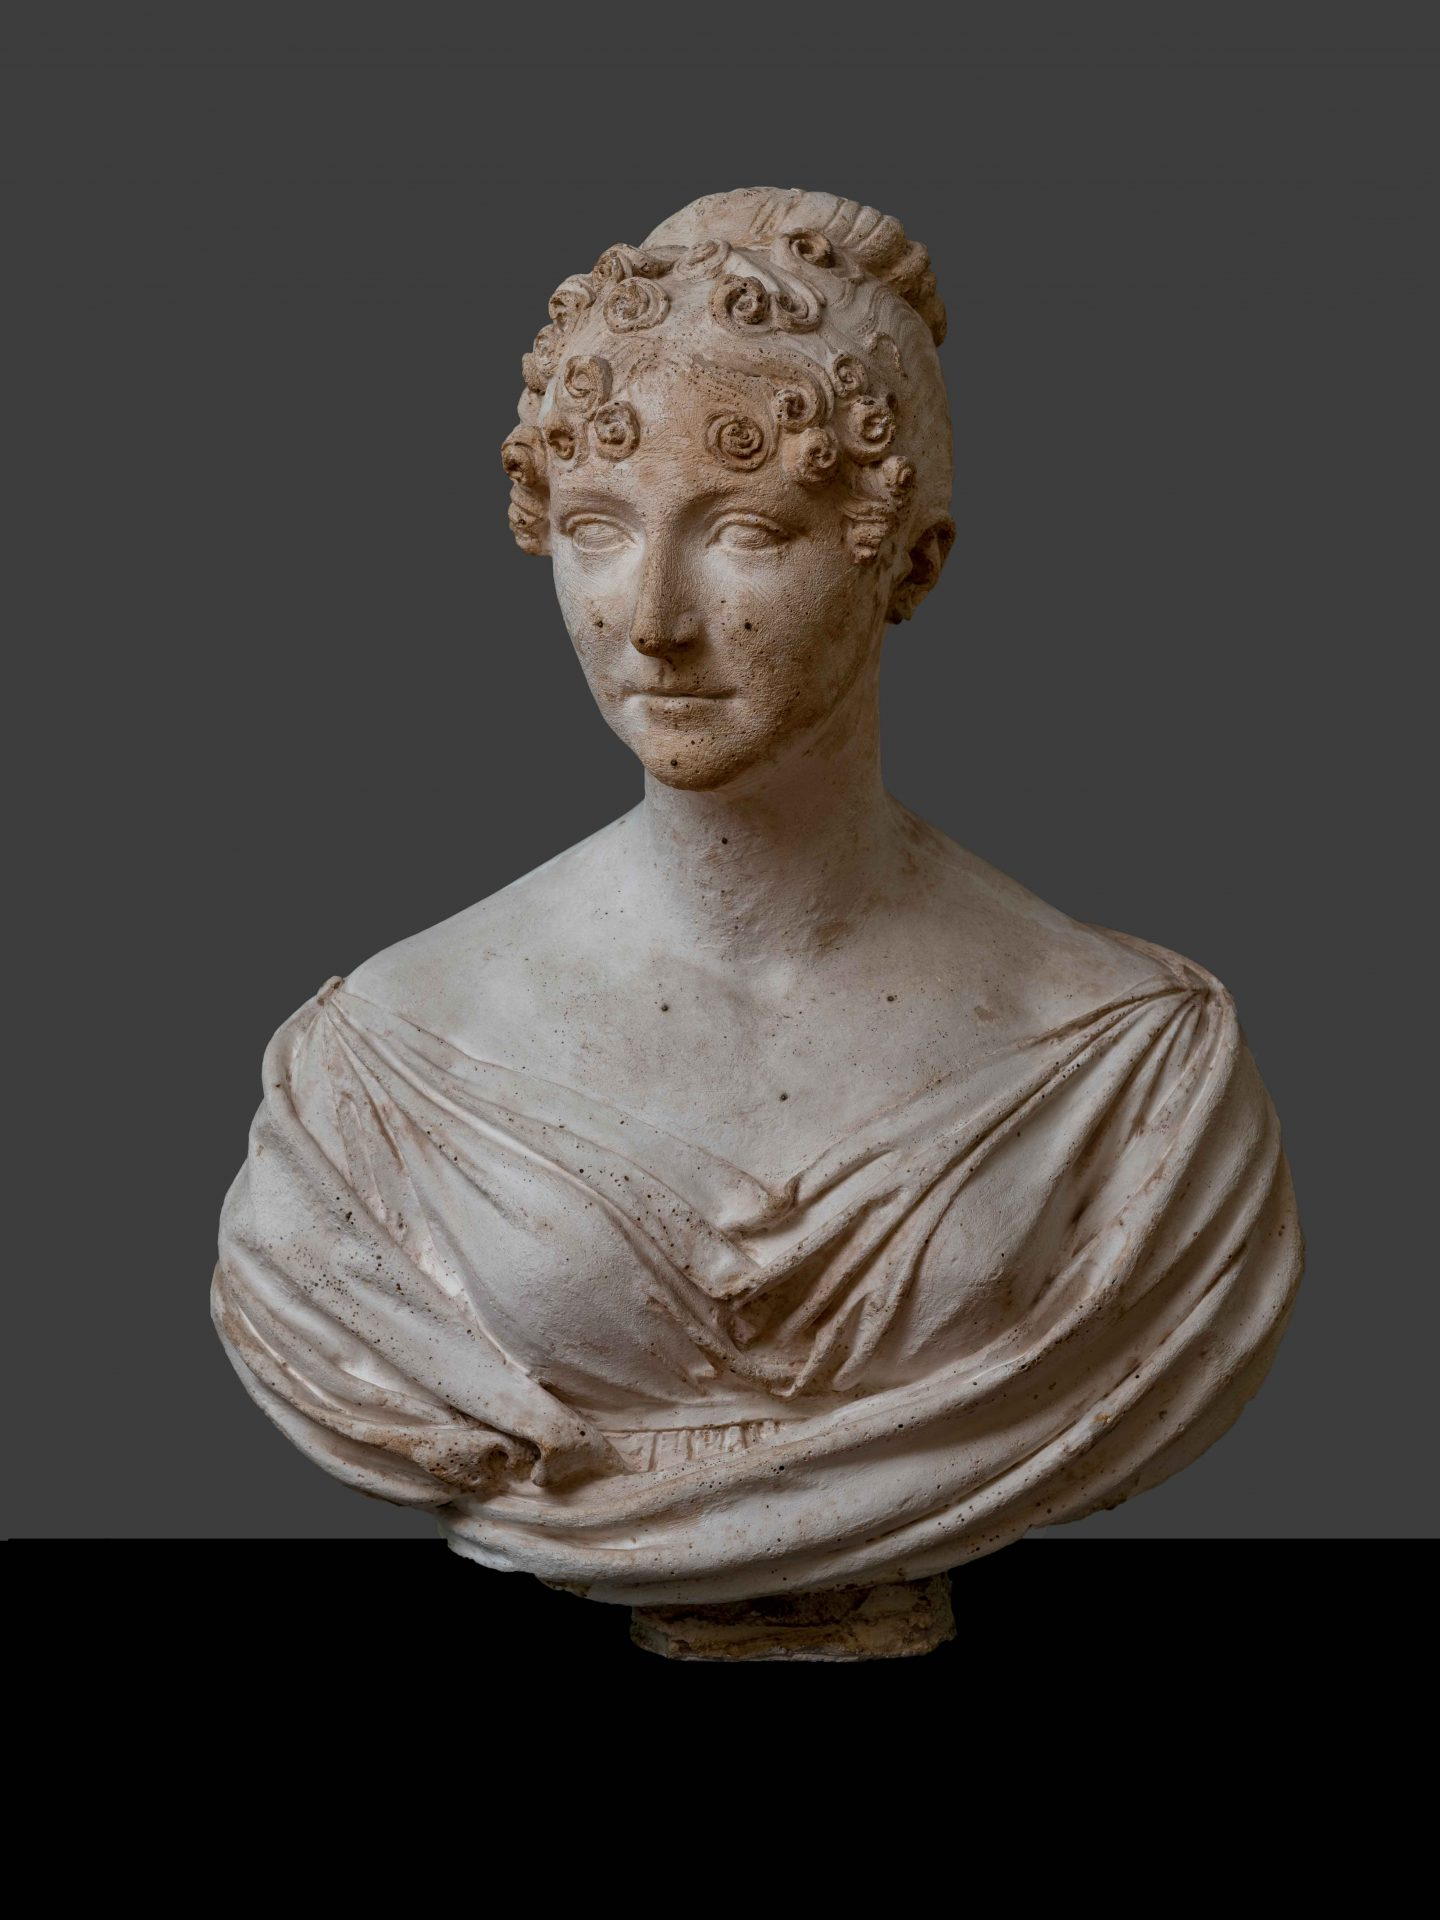 inv. scult. 1590 elisa baciocchi. ph. a. quattrone aqtt0967